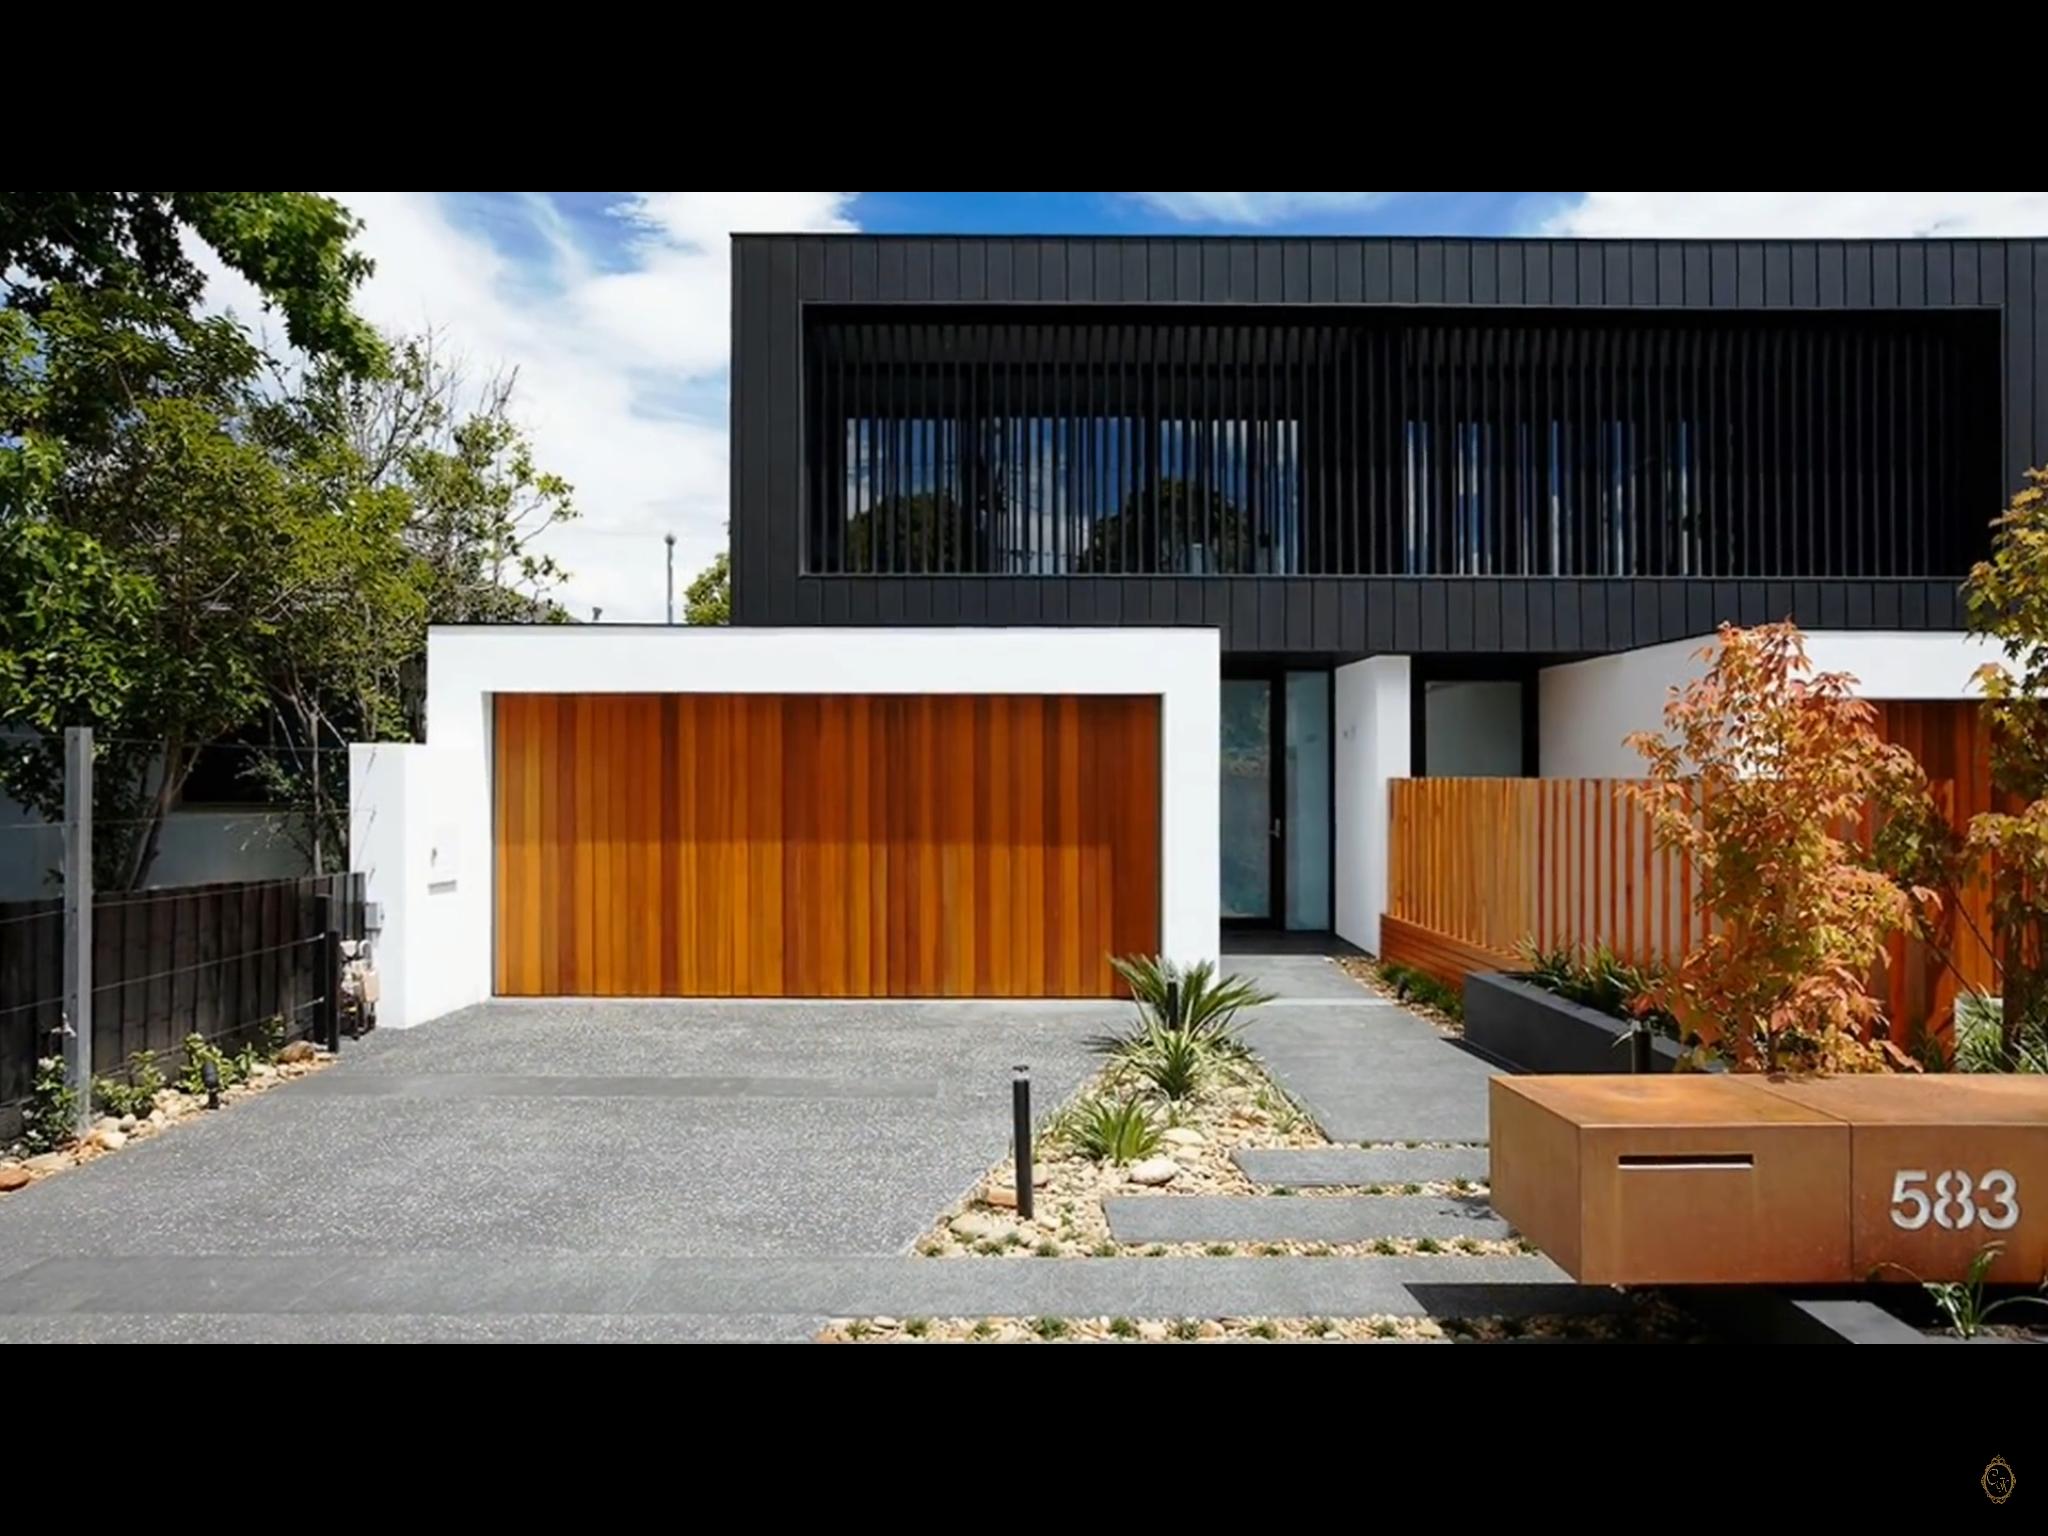 Pin By Jennifer Gee On Container House Modern Garage Doors Garage Doors Contemporary Landscape Design